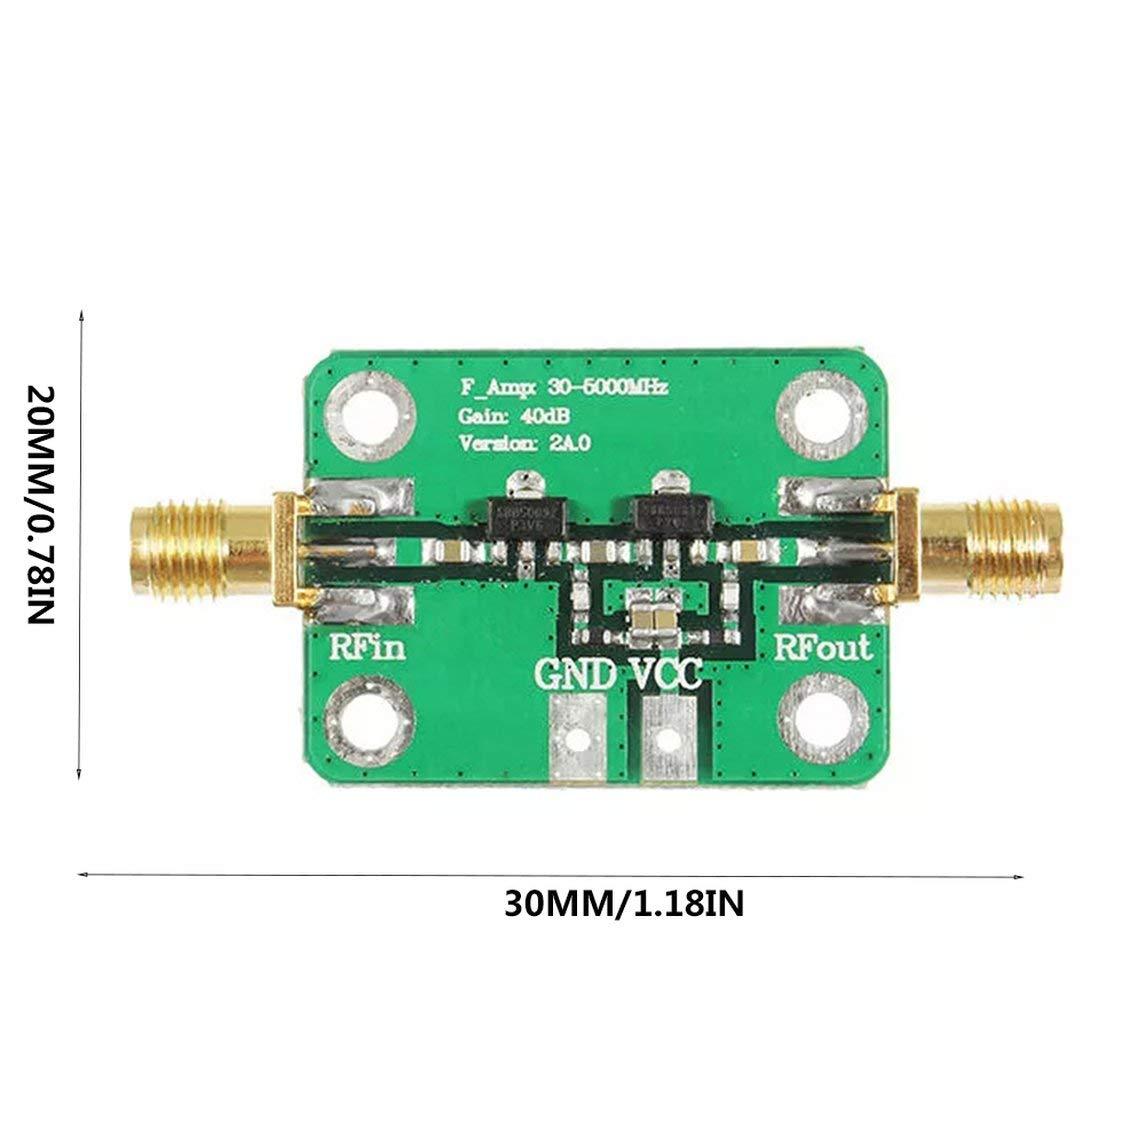 YXTFN 30-4000Mhz 40Db Gain Rf Broadband Amplifier Module for Fm Hf VHF/Uhf 50Ω UBS by Magicalworld (Image #7)